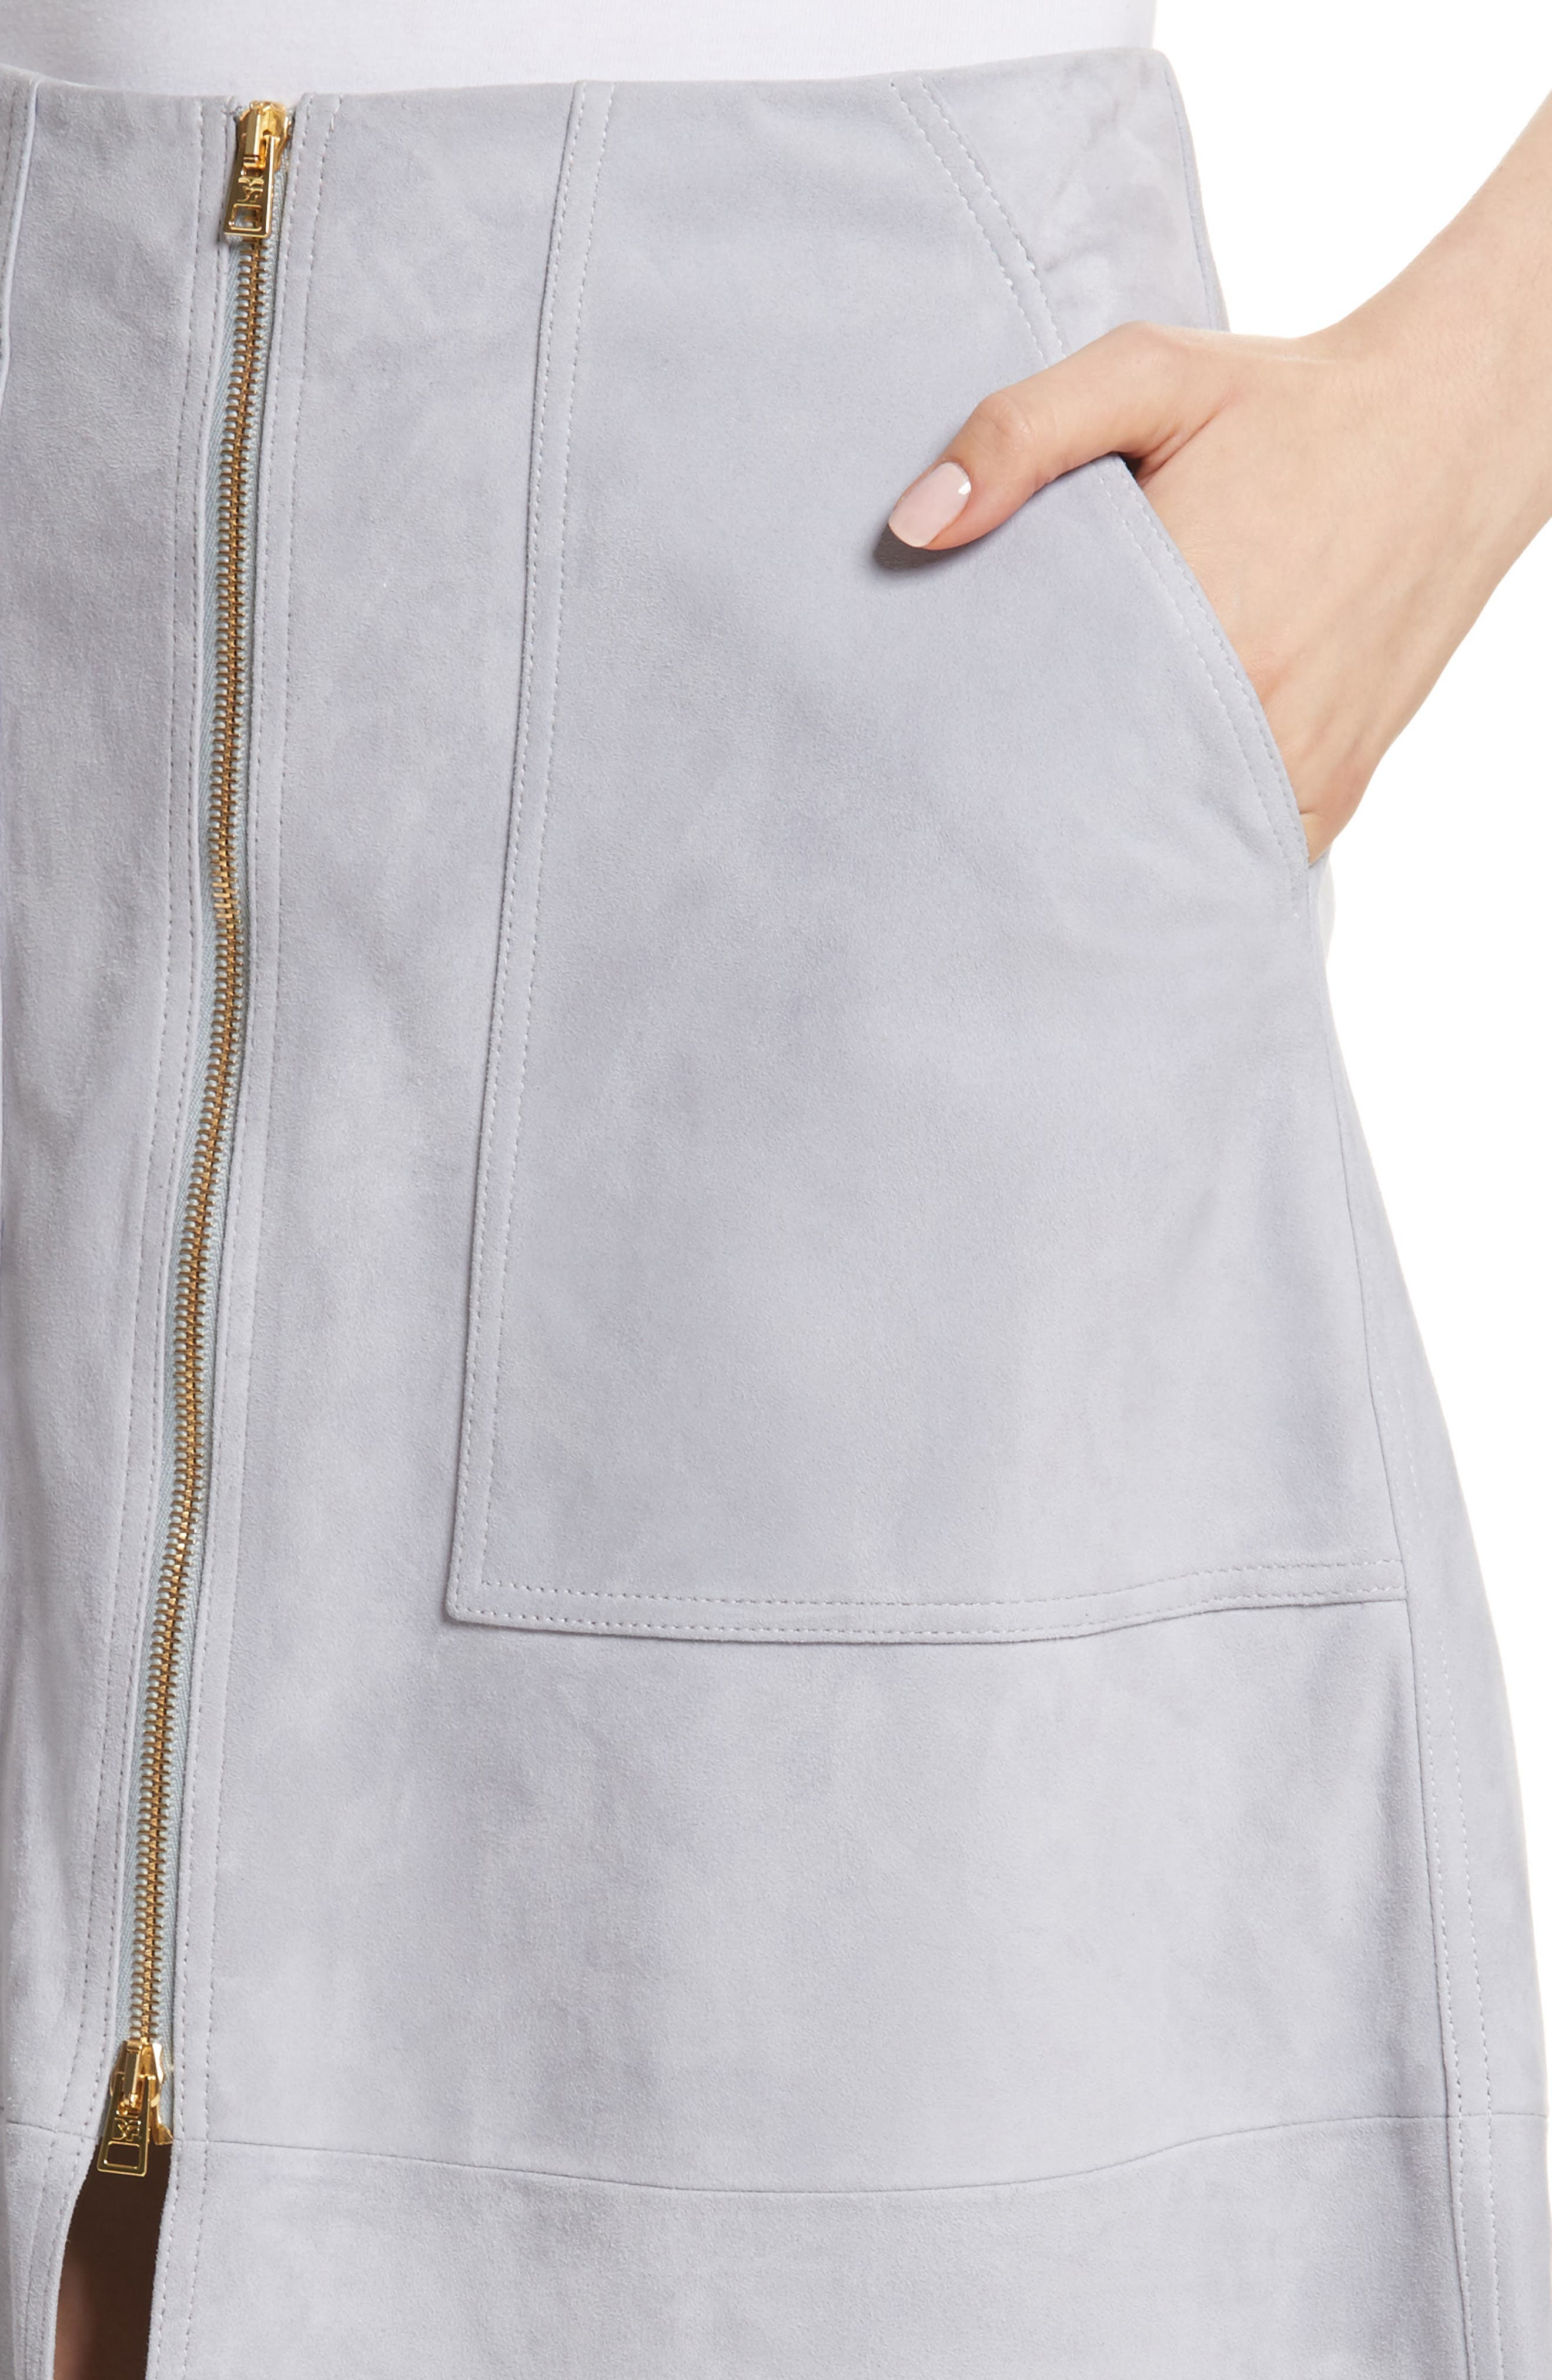 Diane von Furstenberg Patch Pocket Suede Midi Skirt,                             Alternate thumbnail 4, color,                             031